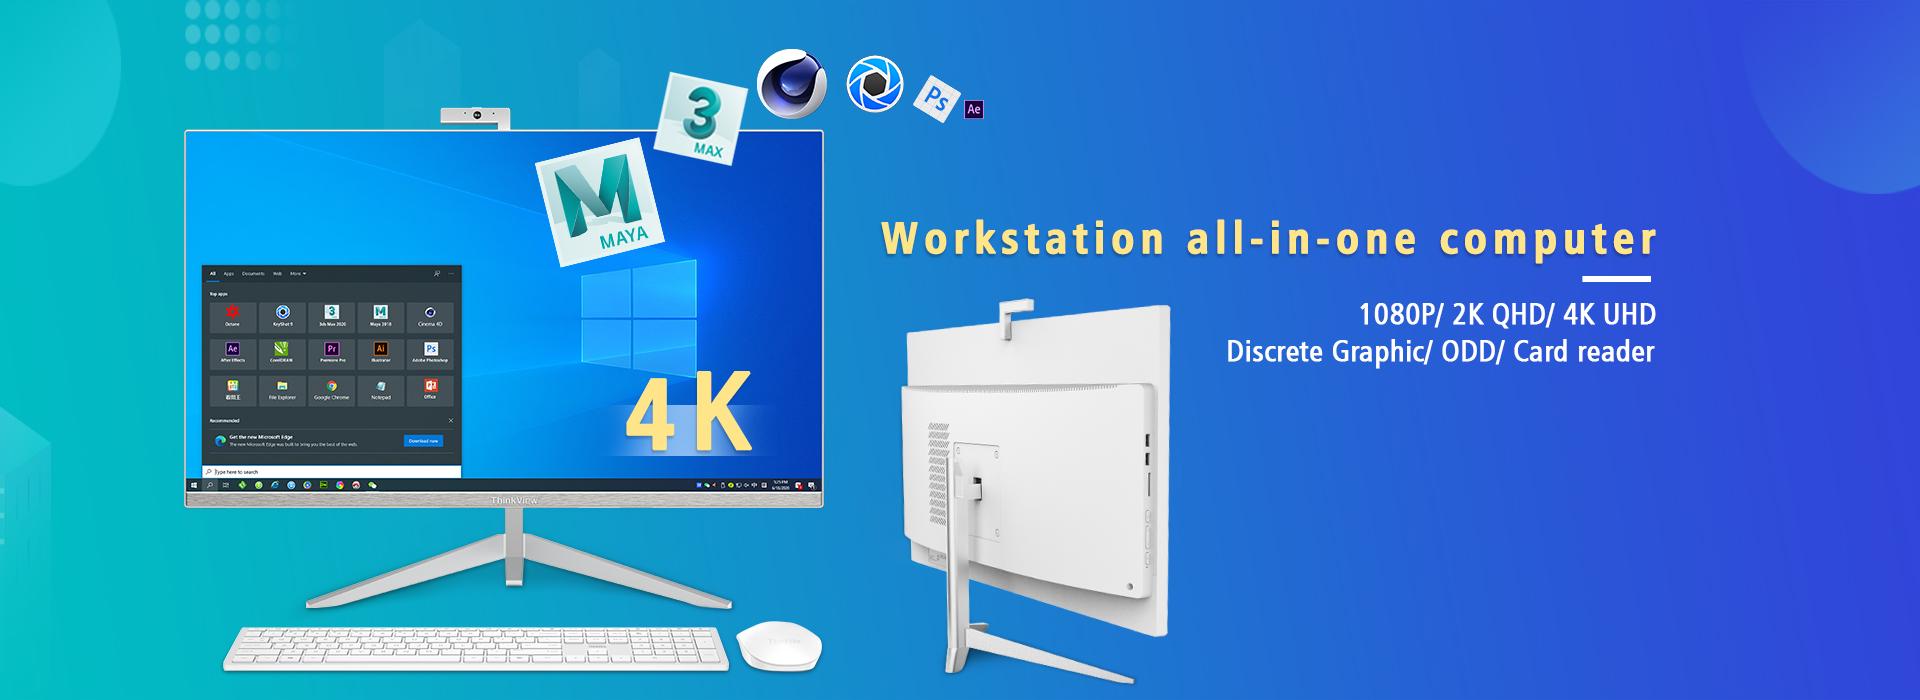 I-Busii Plus Series Zonke kwi-PC enye